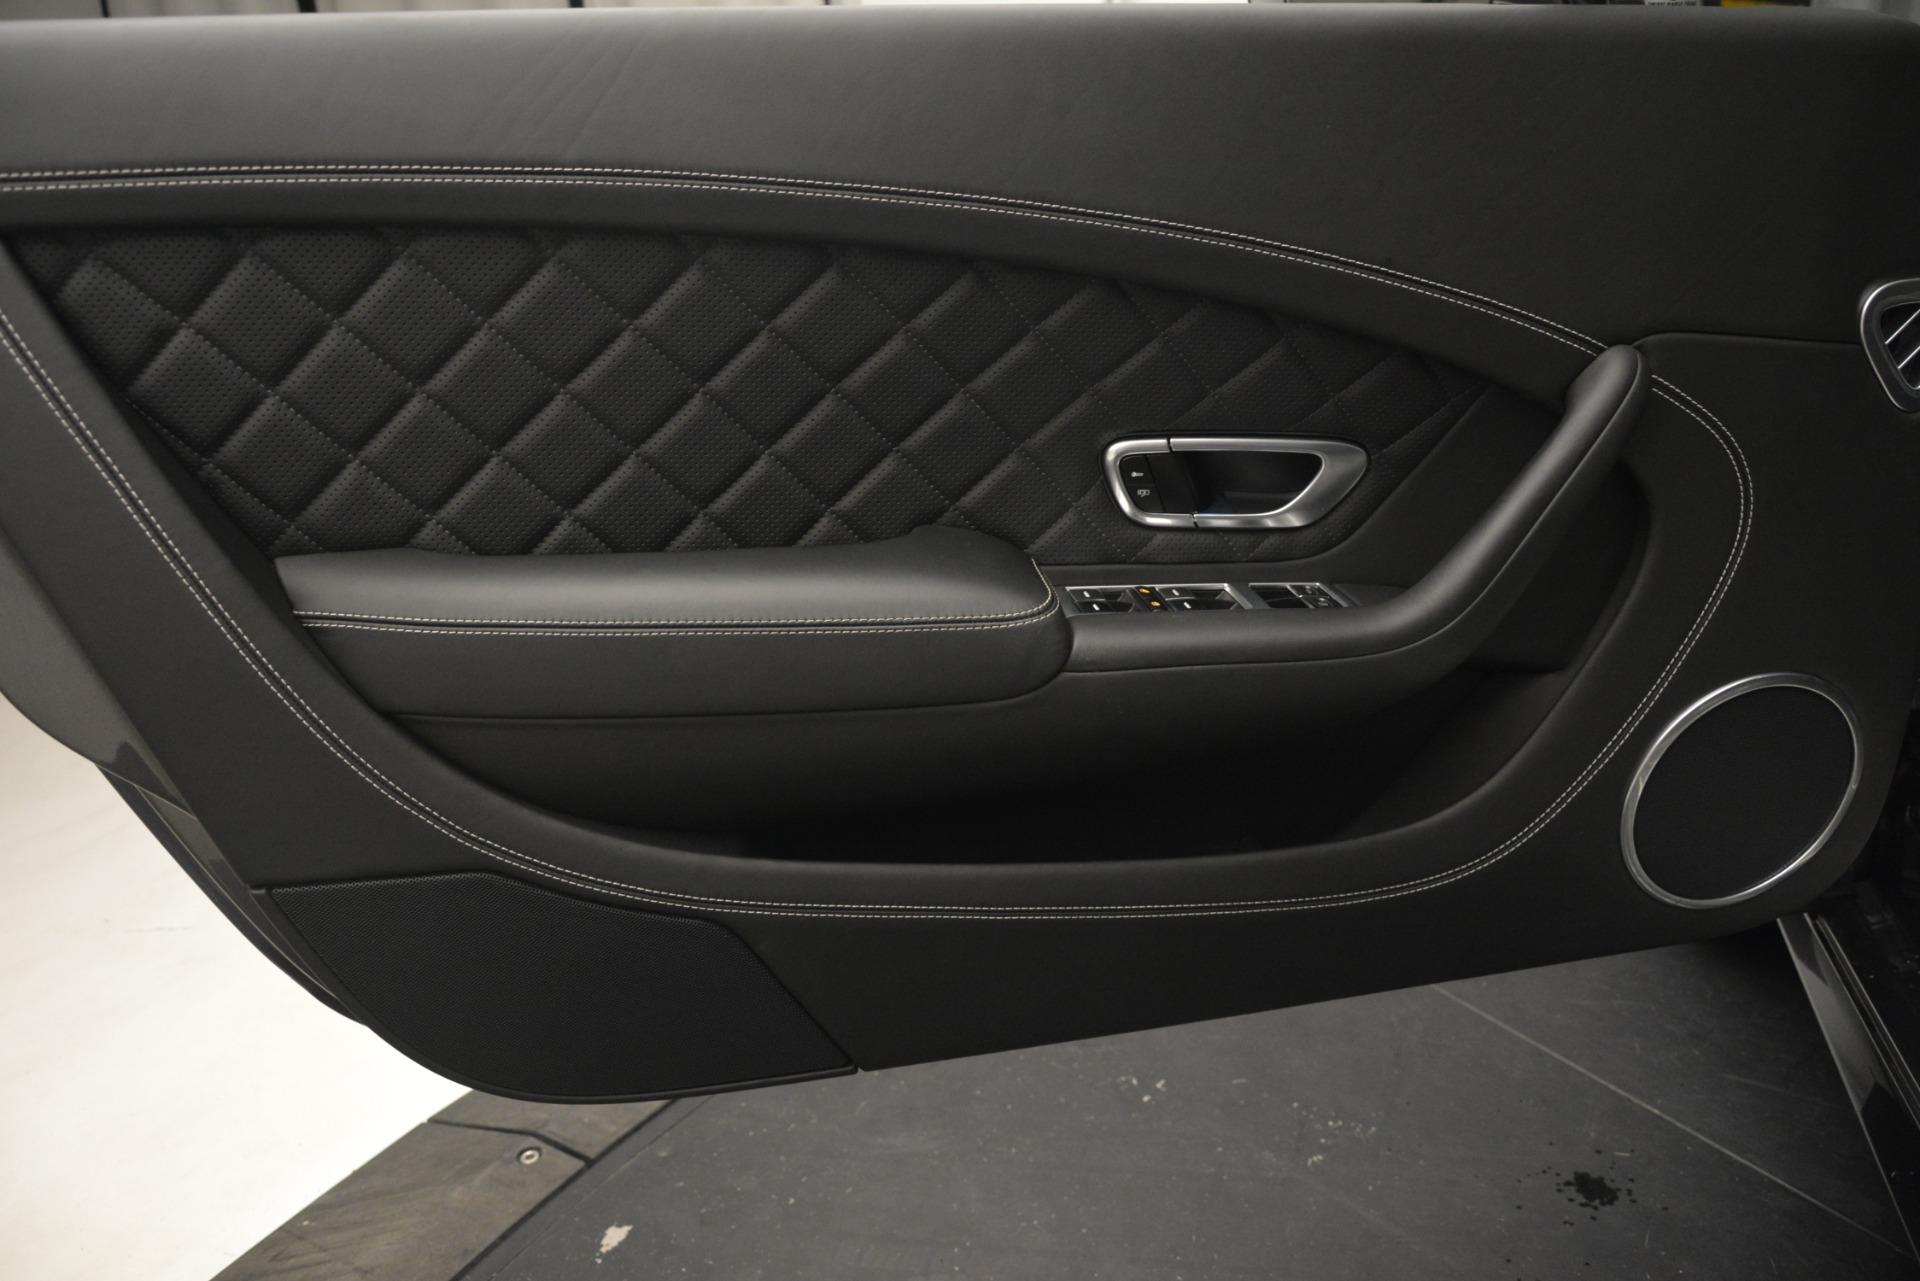 Used 2016 Bentley Continental GT Speed For Sale In Westport, CT 2953_p16